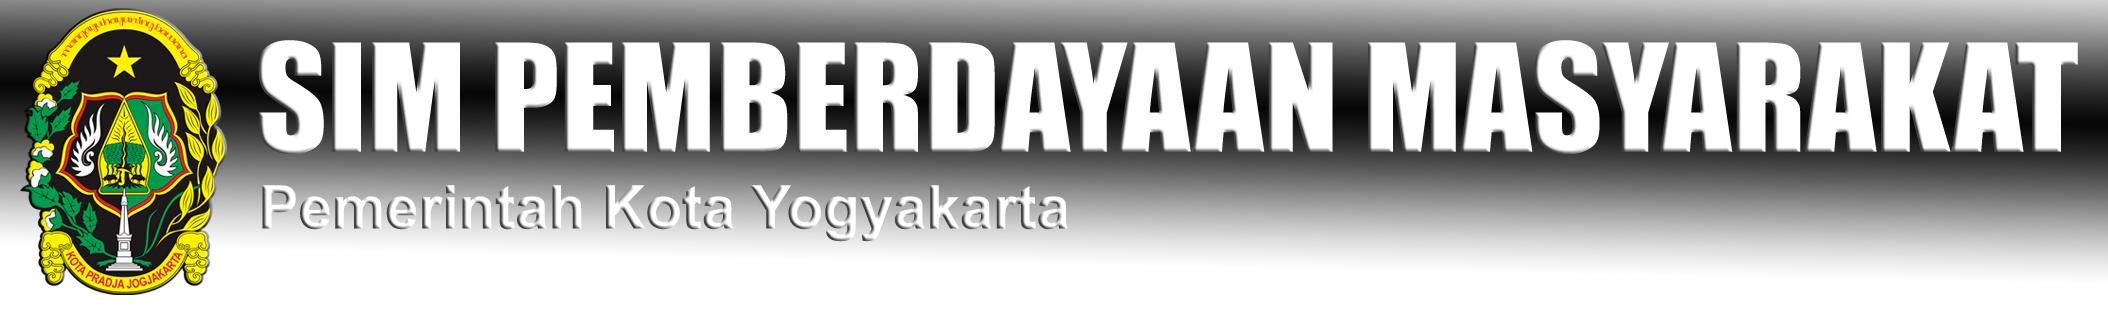 SIM Pemberdayaan masyarakat Kota Yogyakarta